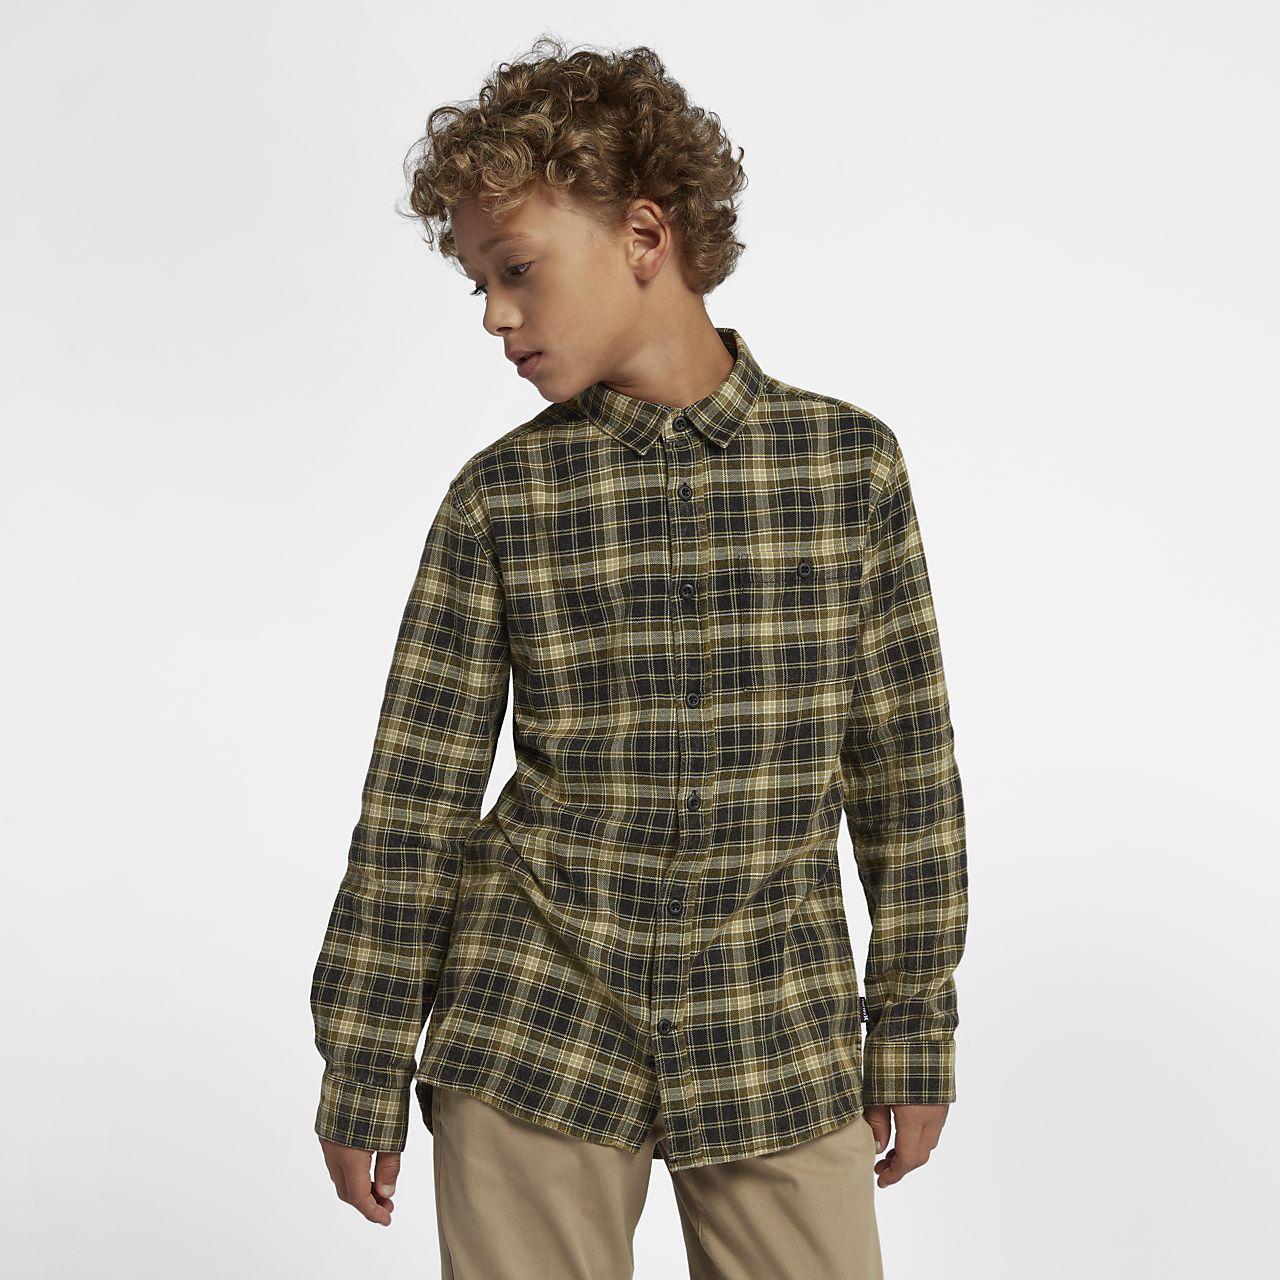 12a484e77ece Μακρυμάνικη υφαντή μπλούζα Hurley Ranger για αγόρια. Nike.com GR